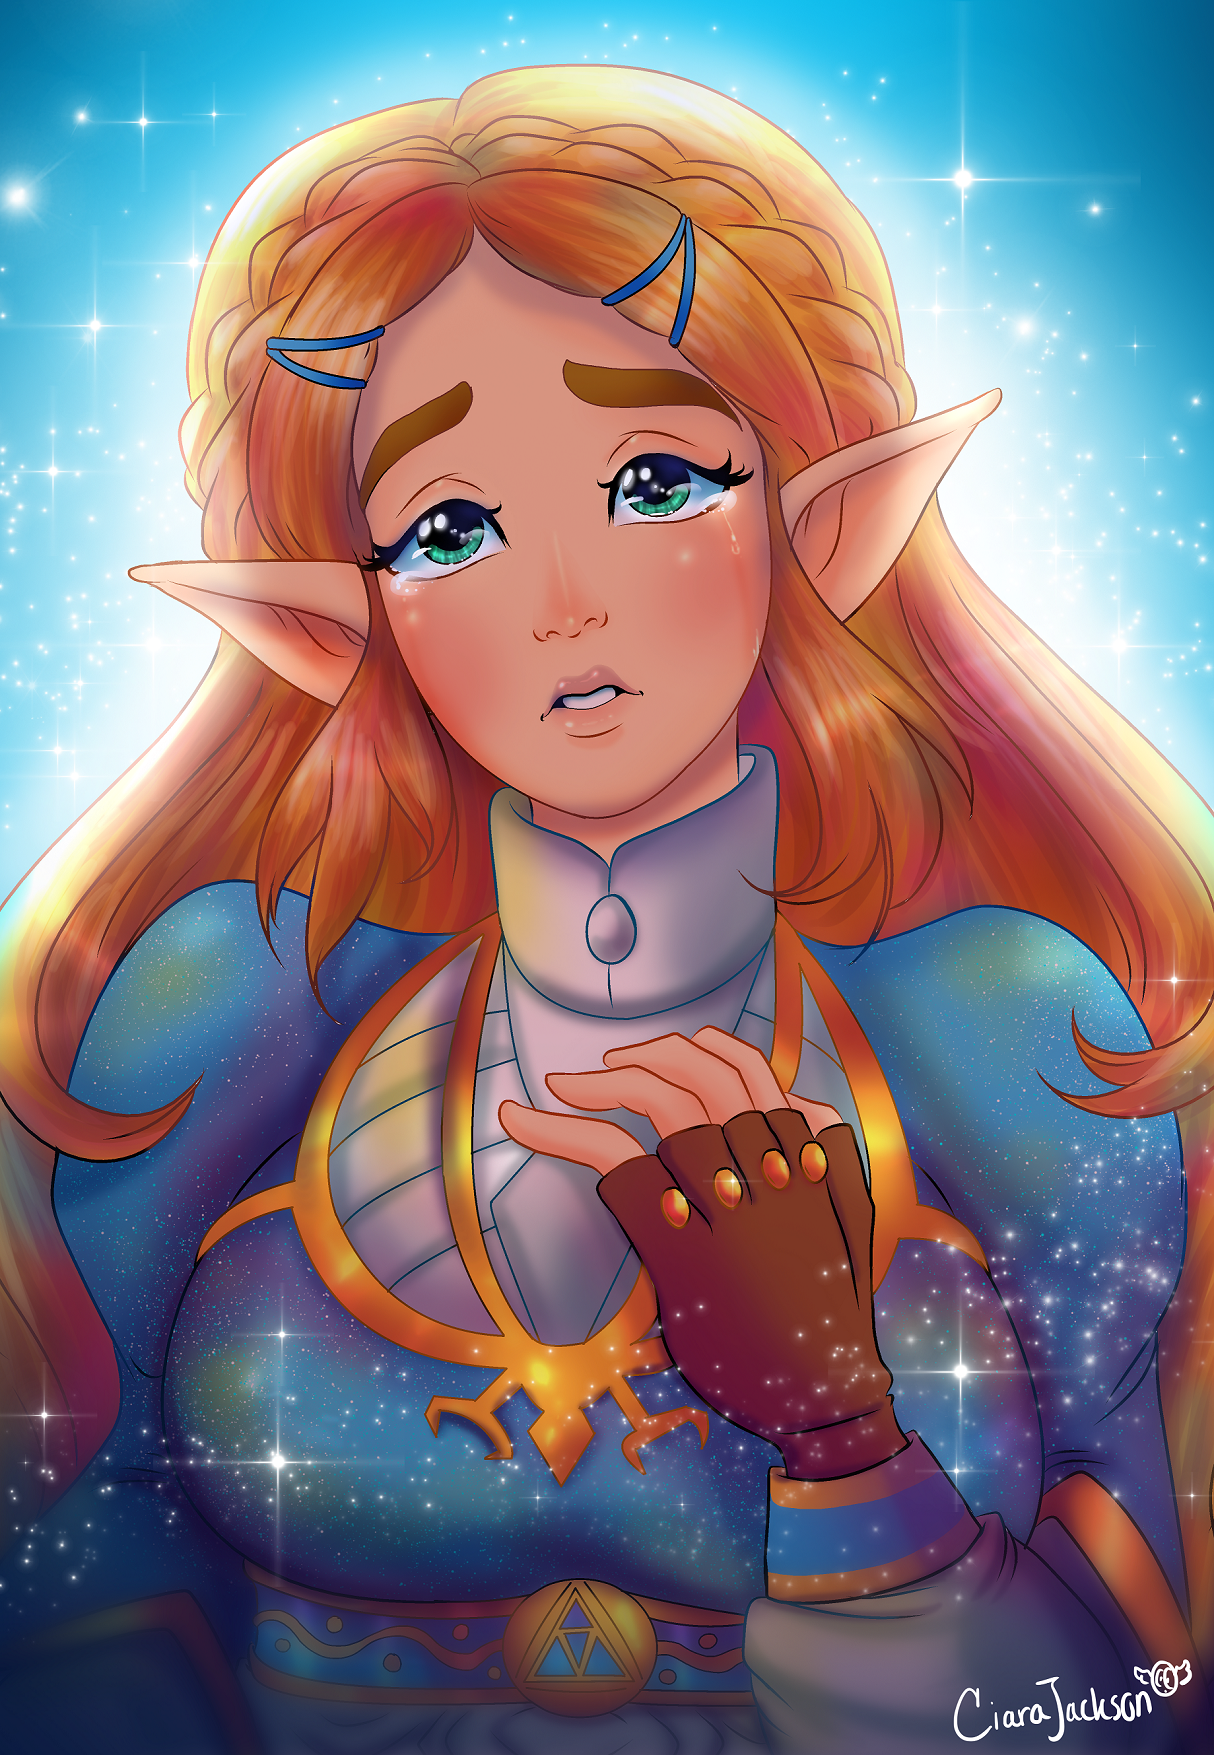 Breath of the Wild: Zelda's Tears